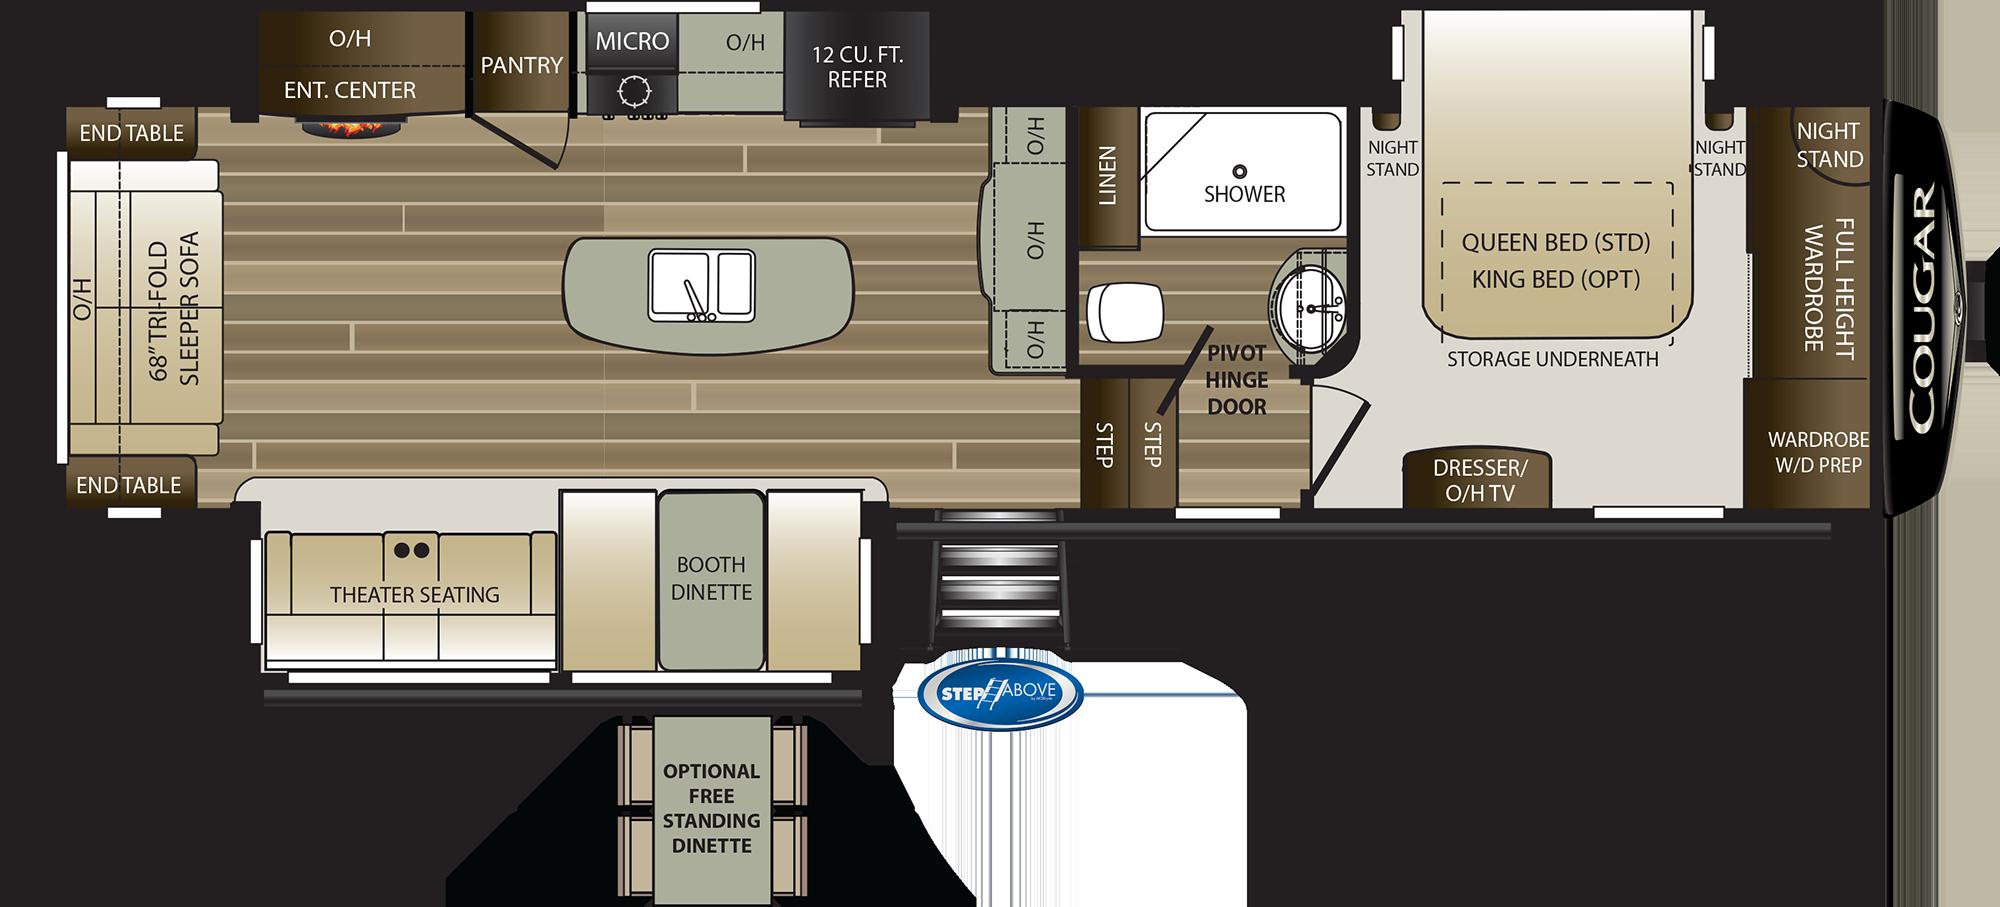 2020 KEYSTONE COUGAR 315RLS (couples) Floorplan